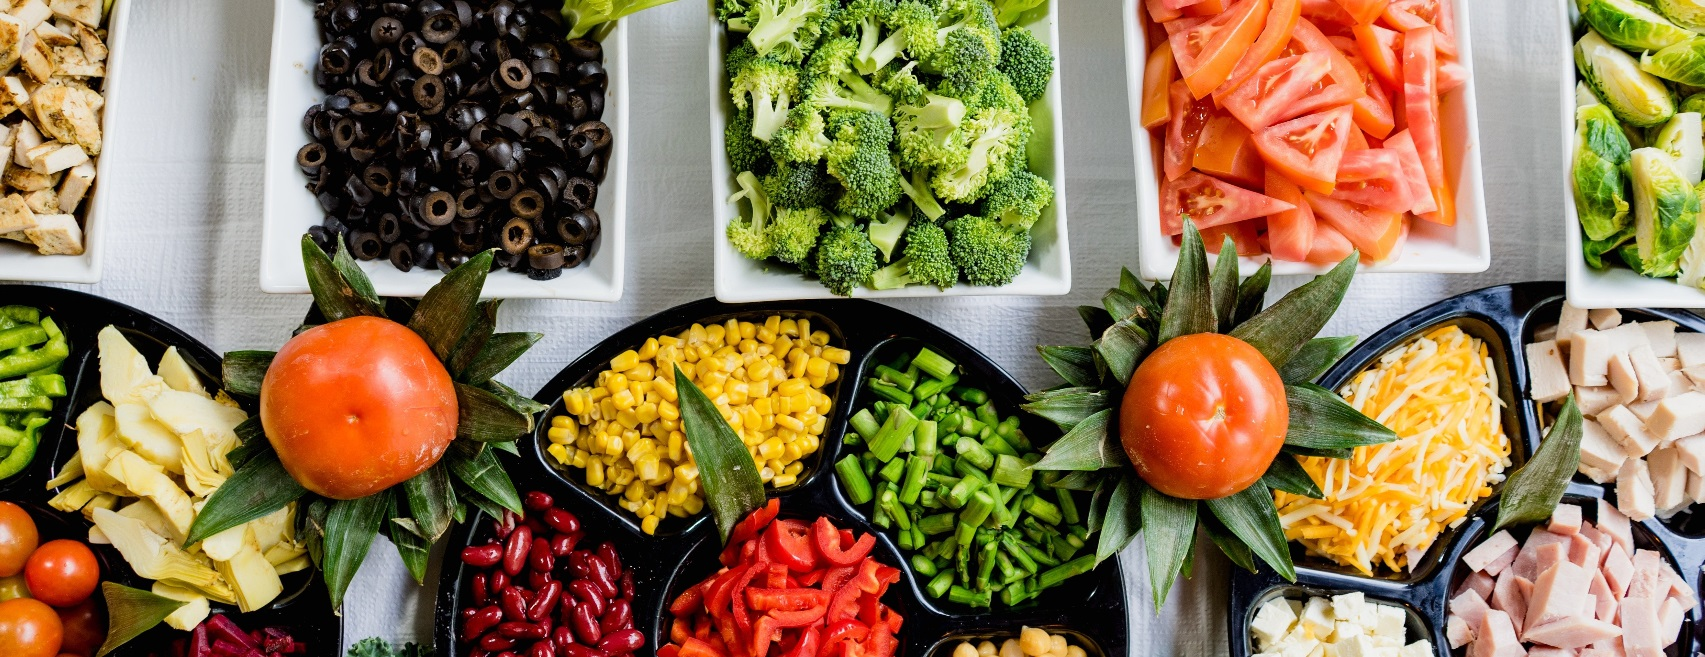 Takeaway Health Food Business (2 Stores) / Melbourne CBD in Victoria, Australia